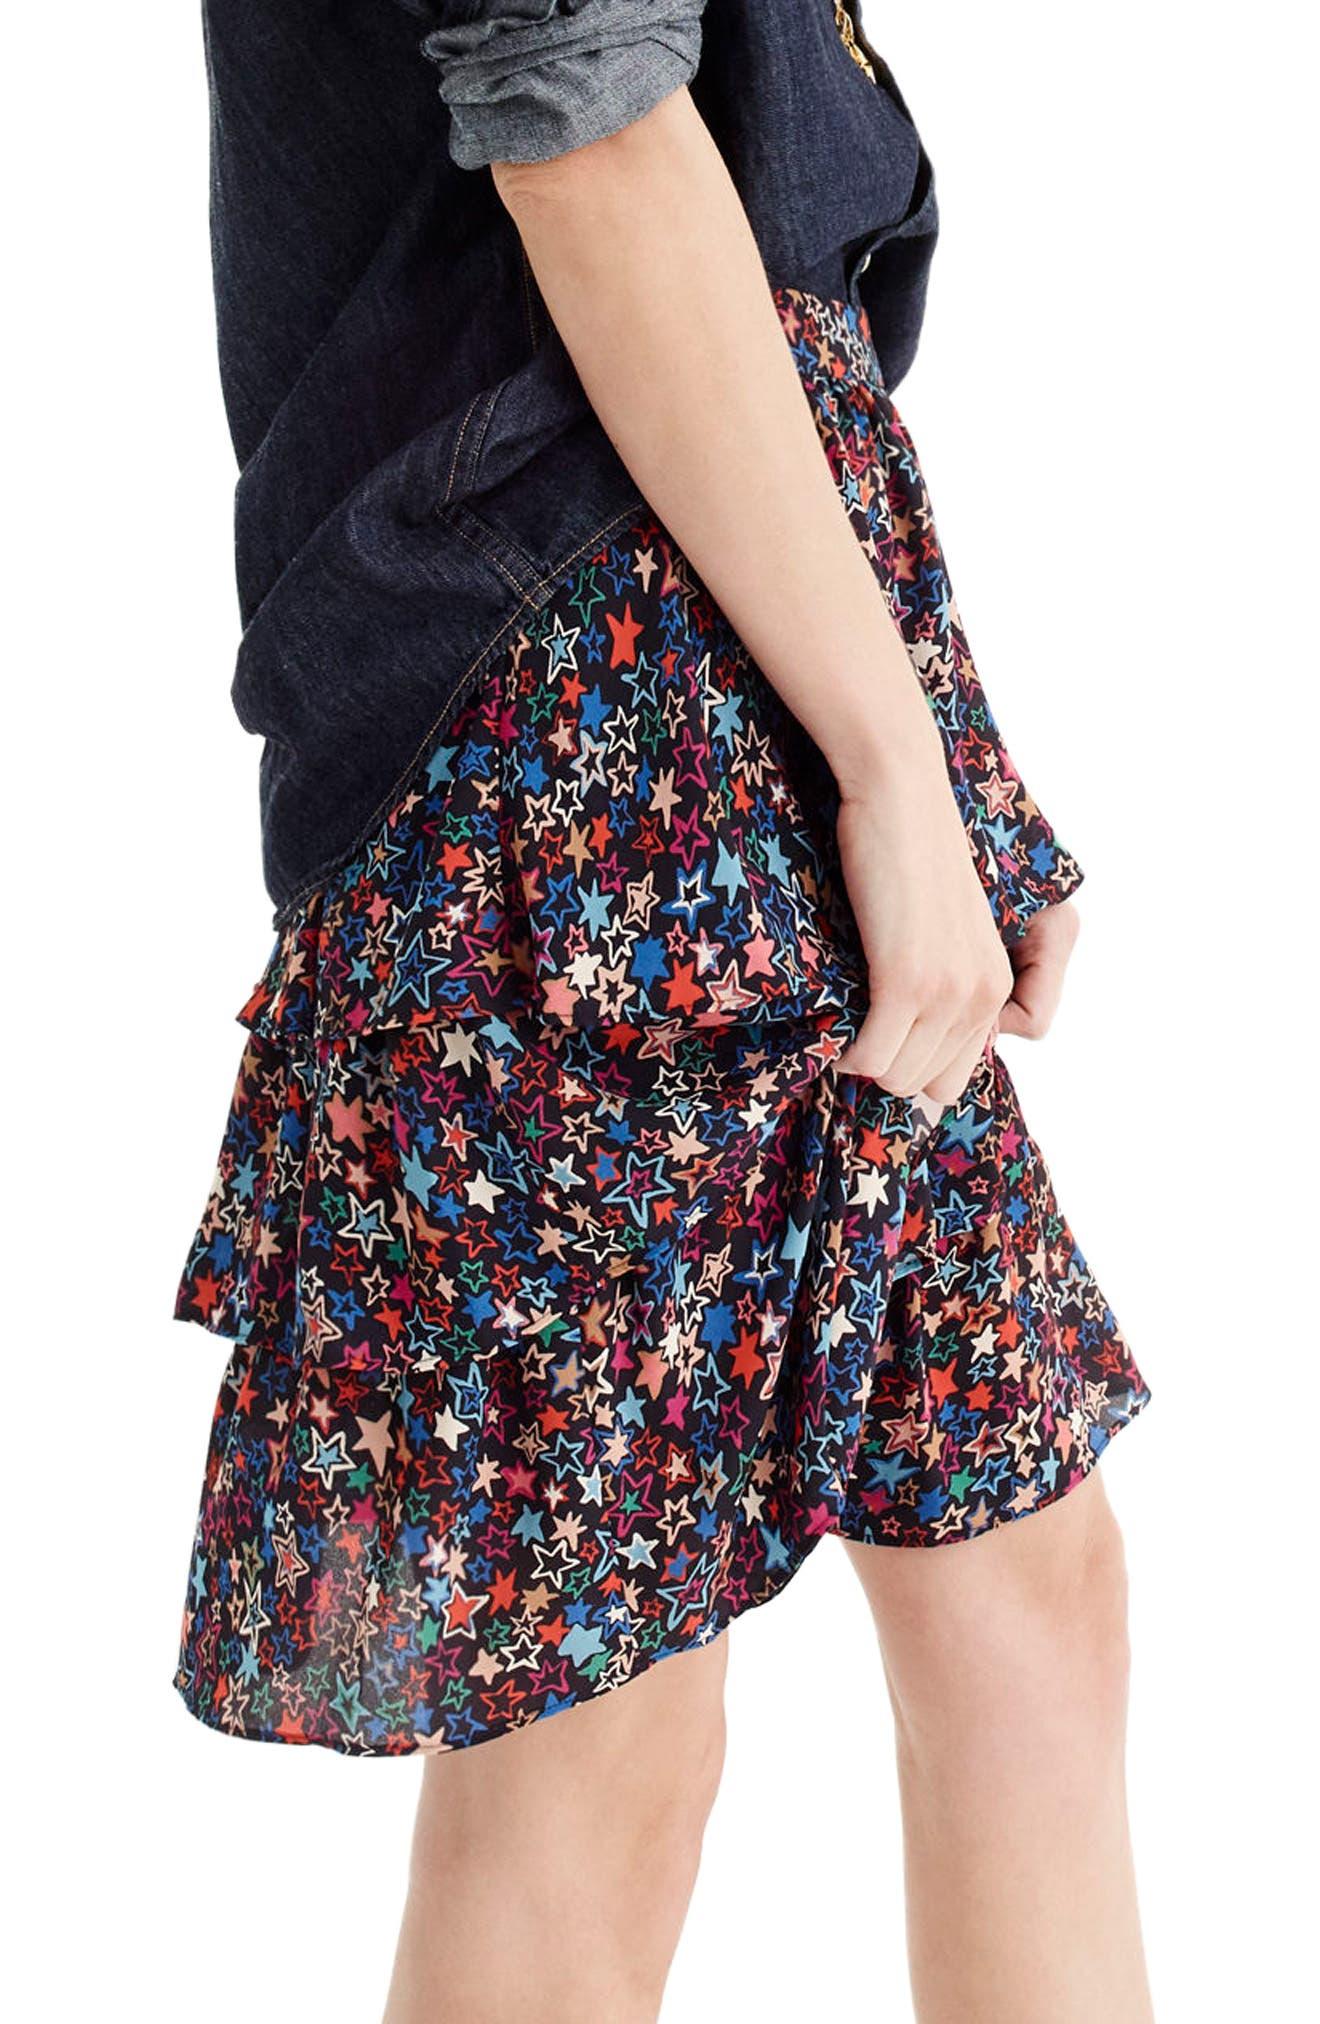 J.CREW,                             Star Print Tiered Skirt,                             Alternate thumbnail 3, color,                             409